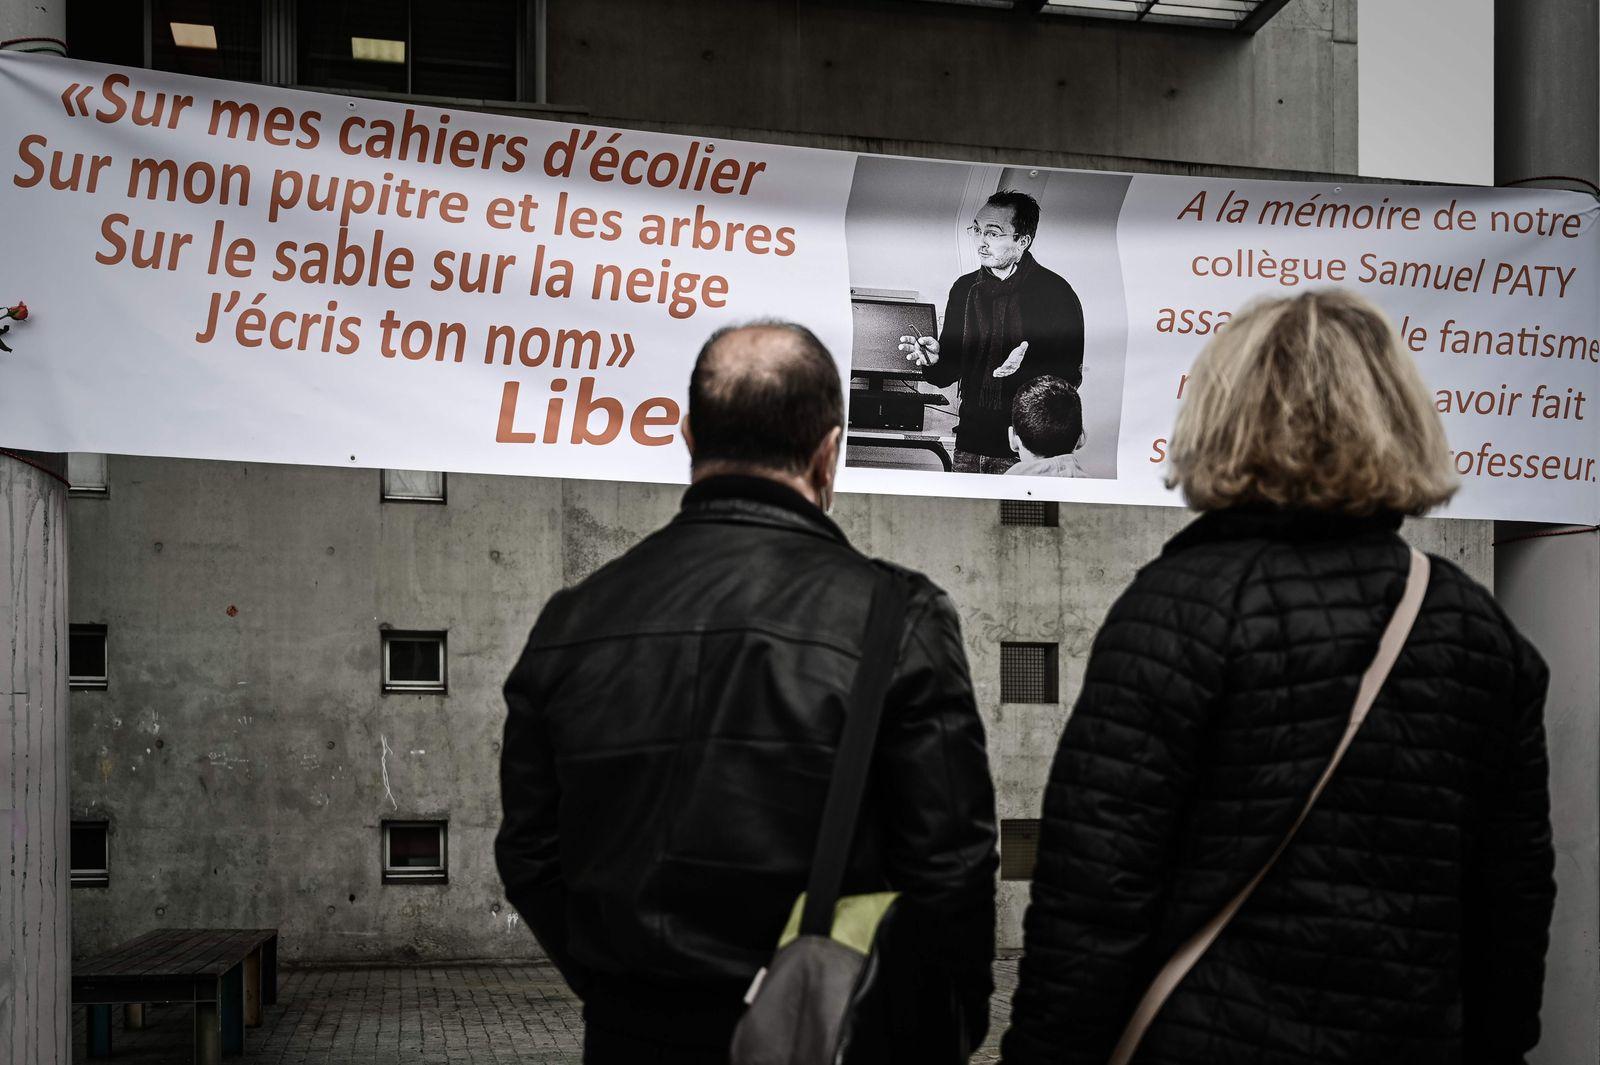 FRANCE-ATTACK-EDUCATION-RELIGION-POLITICS